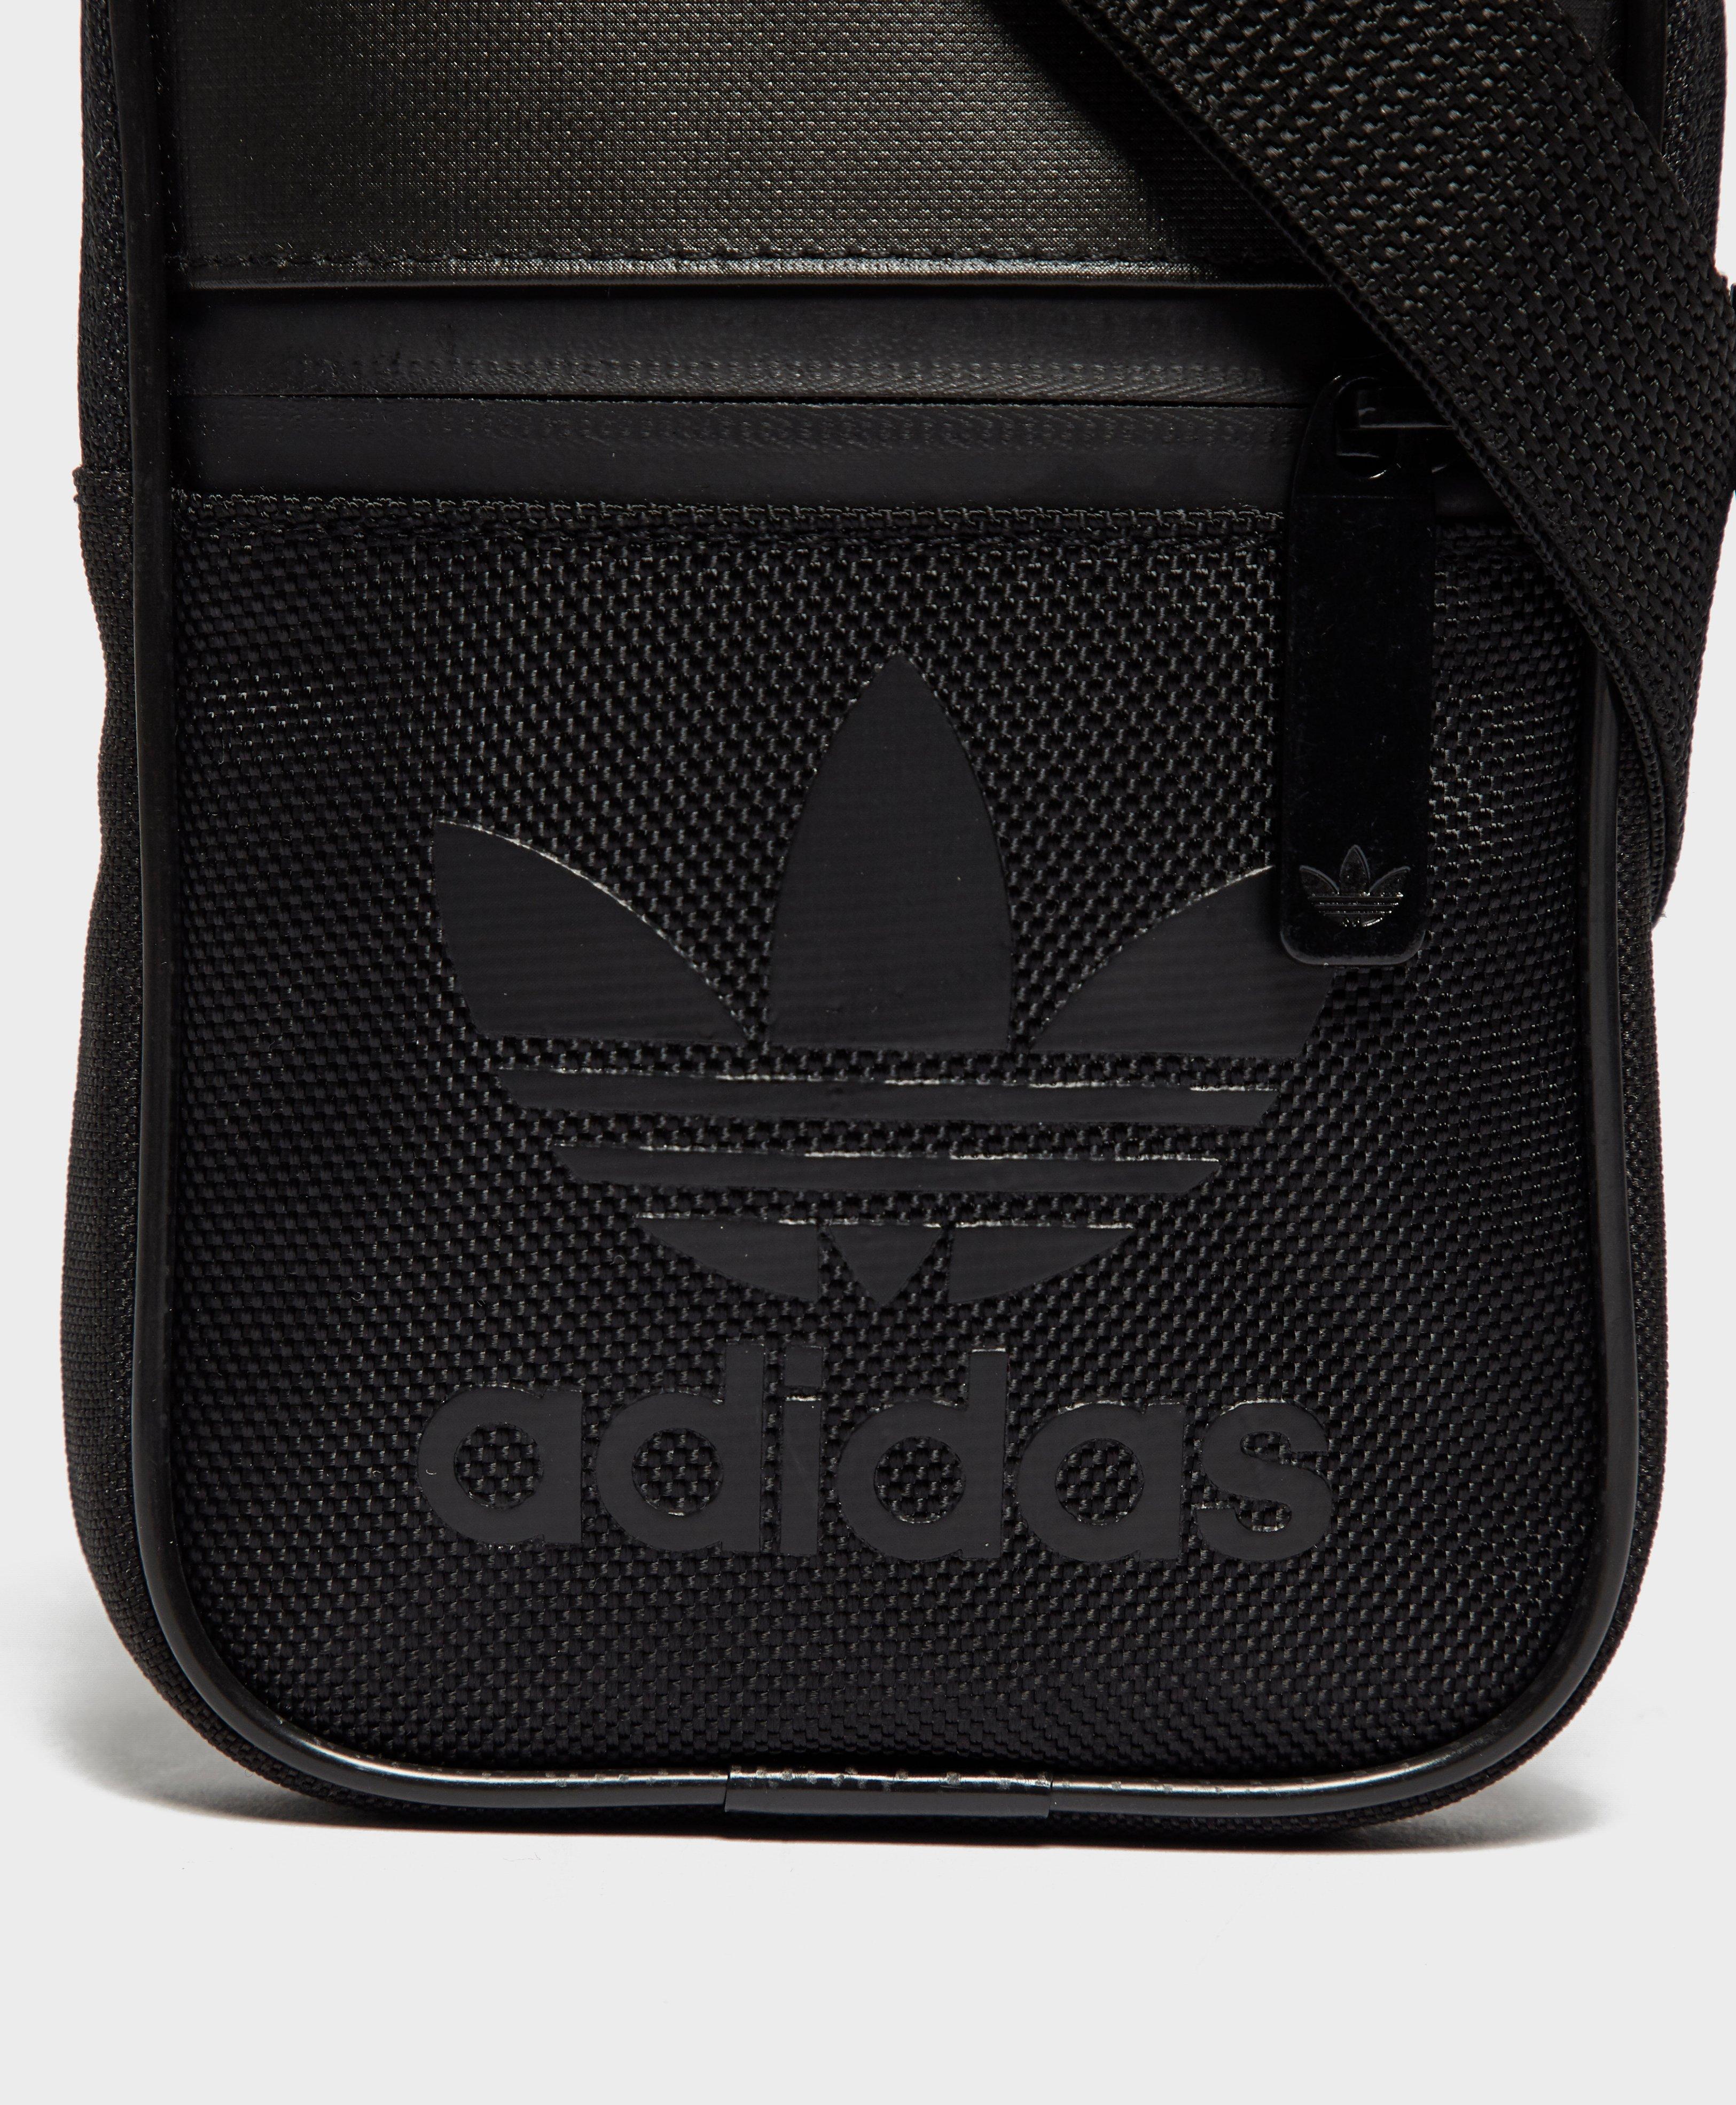 2248f302b332 Lyst - adidas Originals Festival Bag in Black for Men